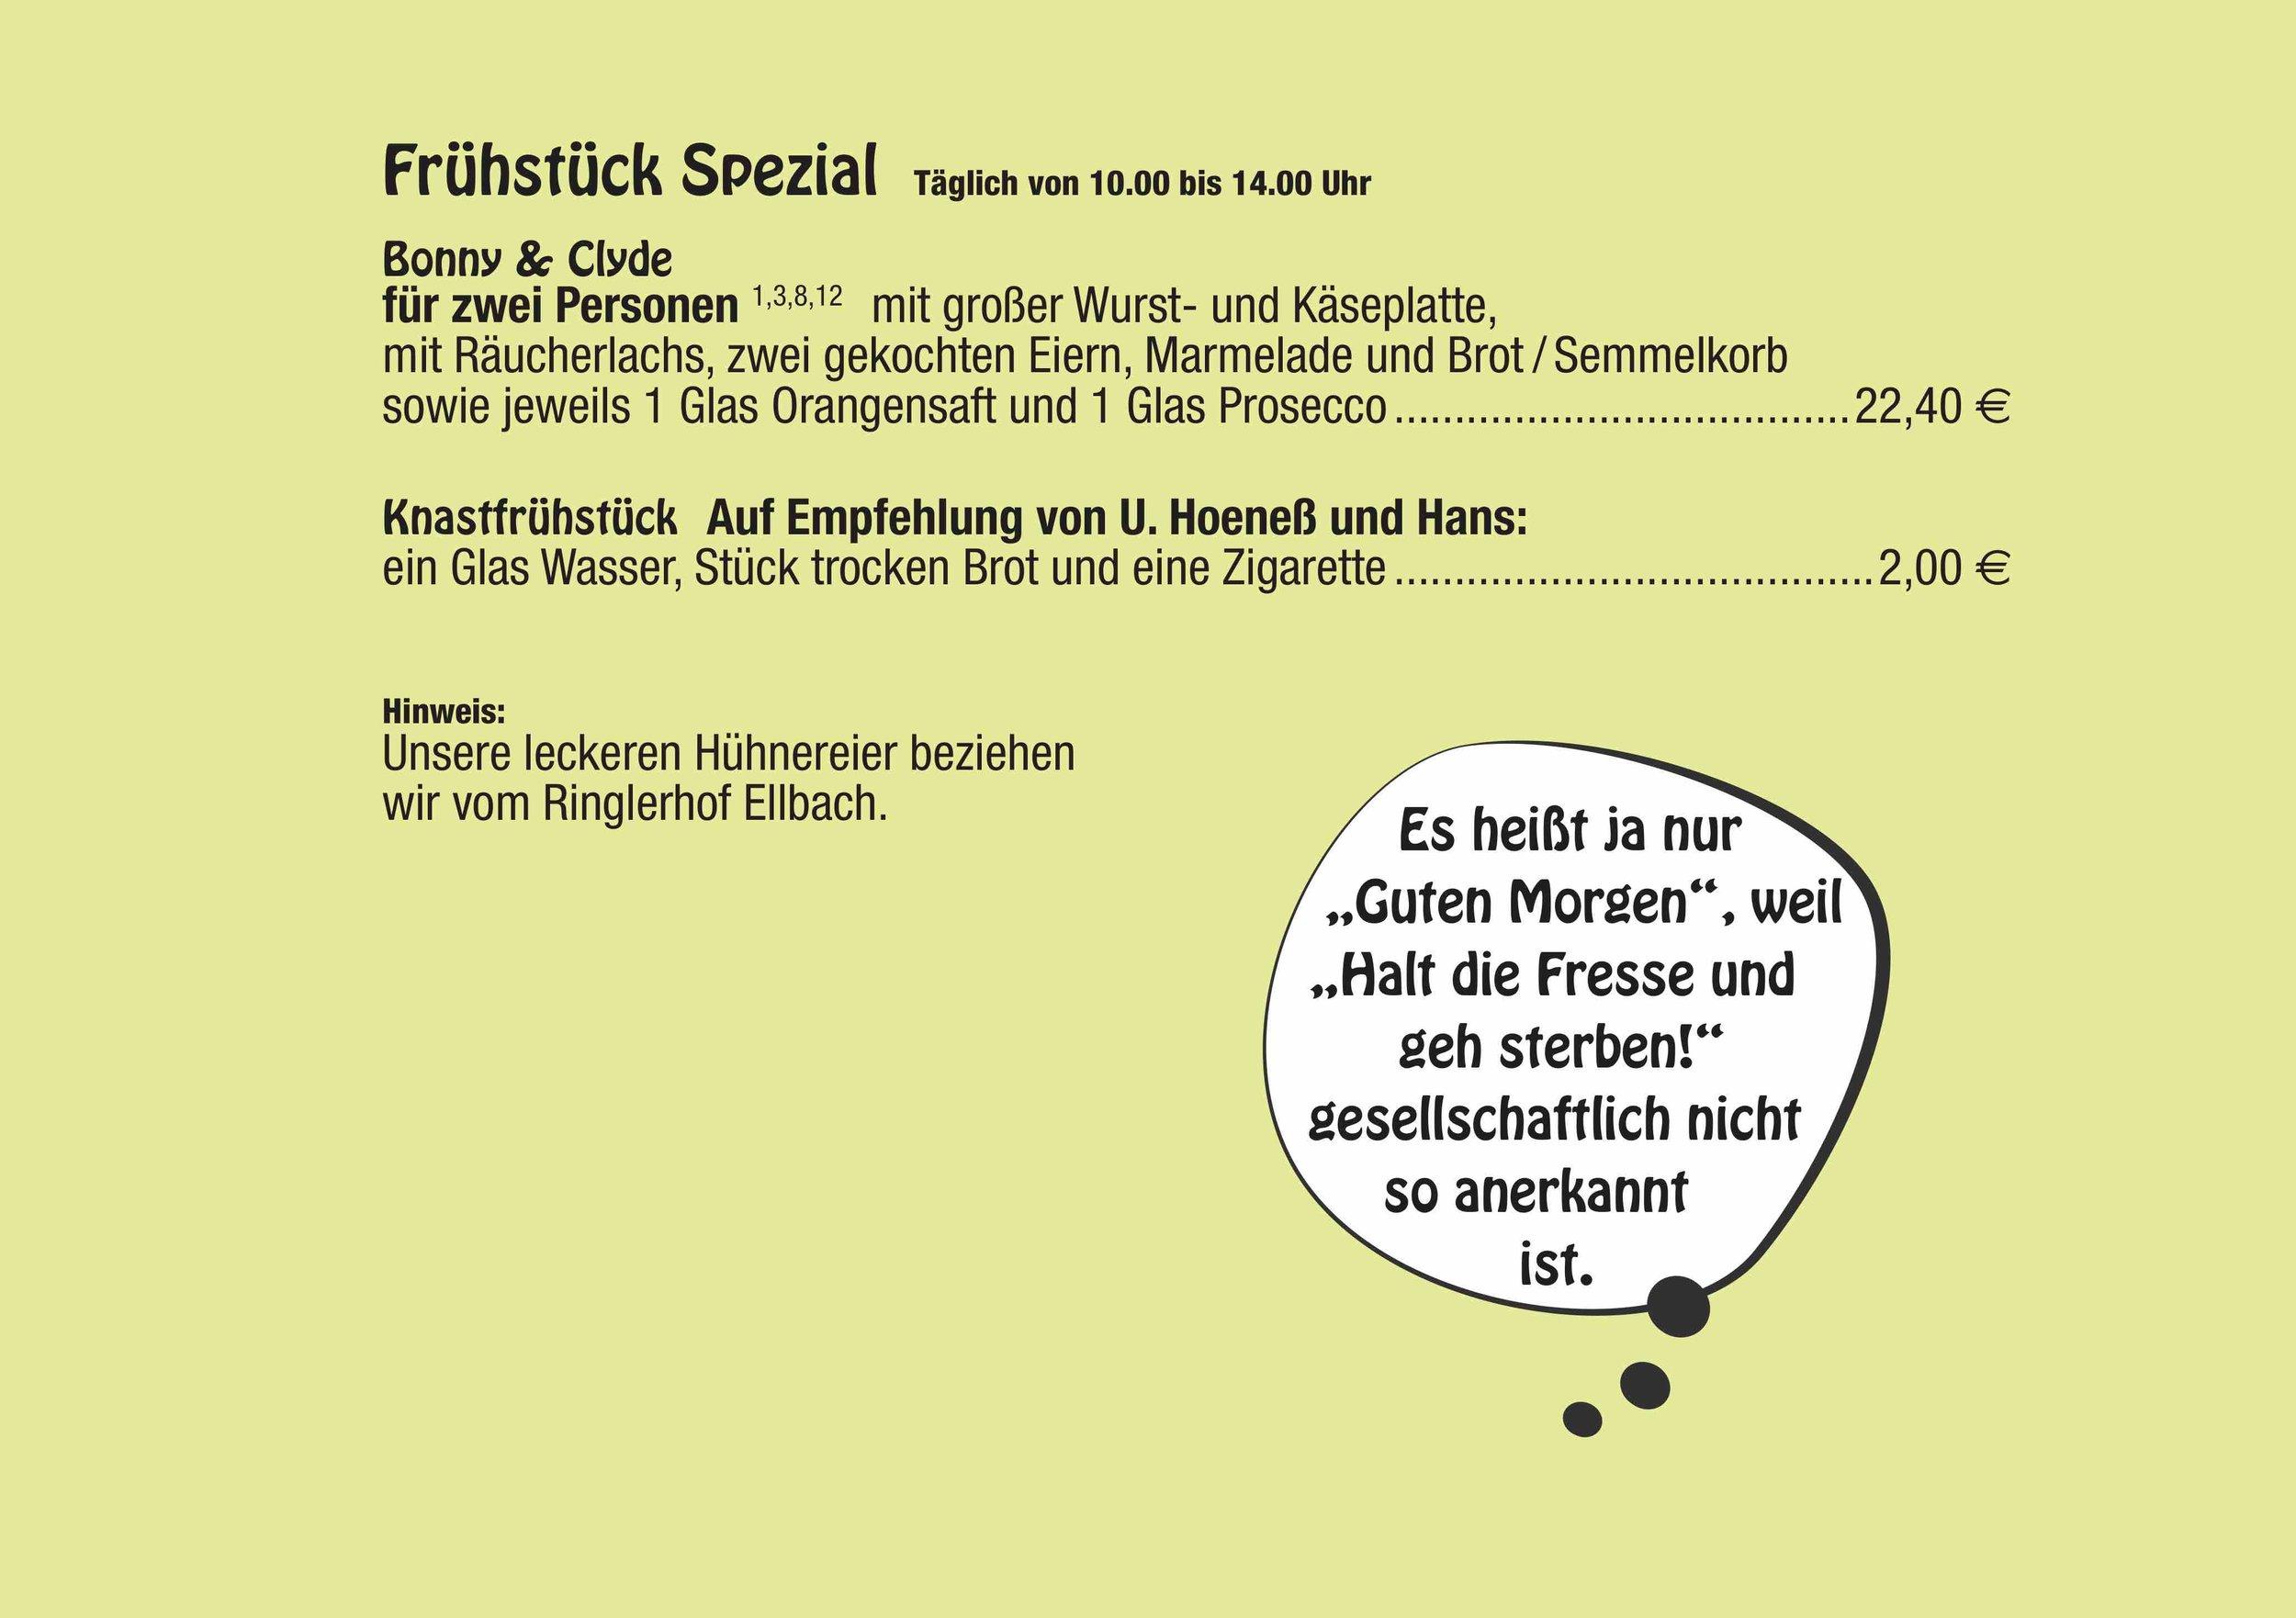 Kesselhaus_Bad_Tölz_Speisekarte_Frühstück_Spezial.jpg